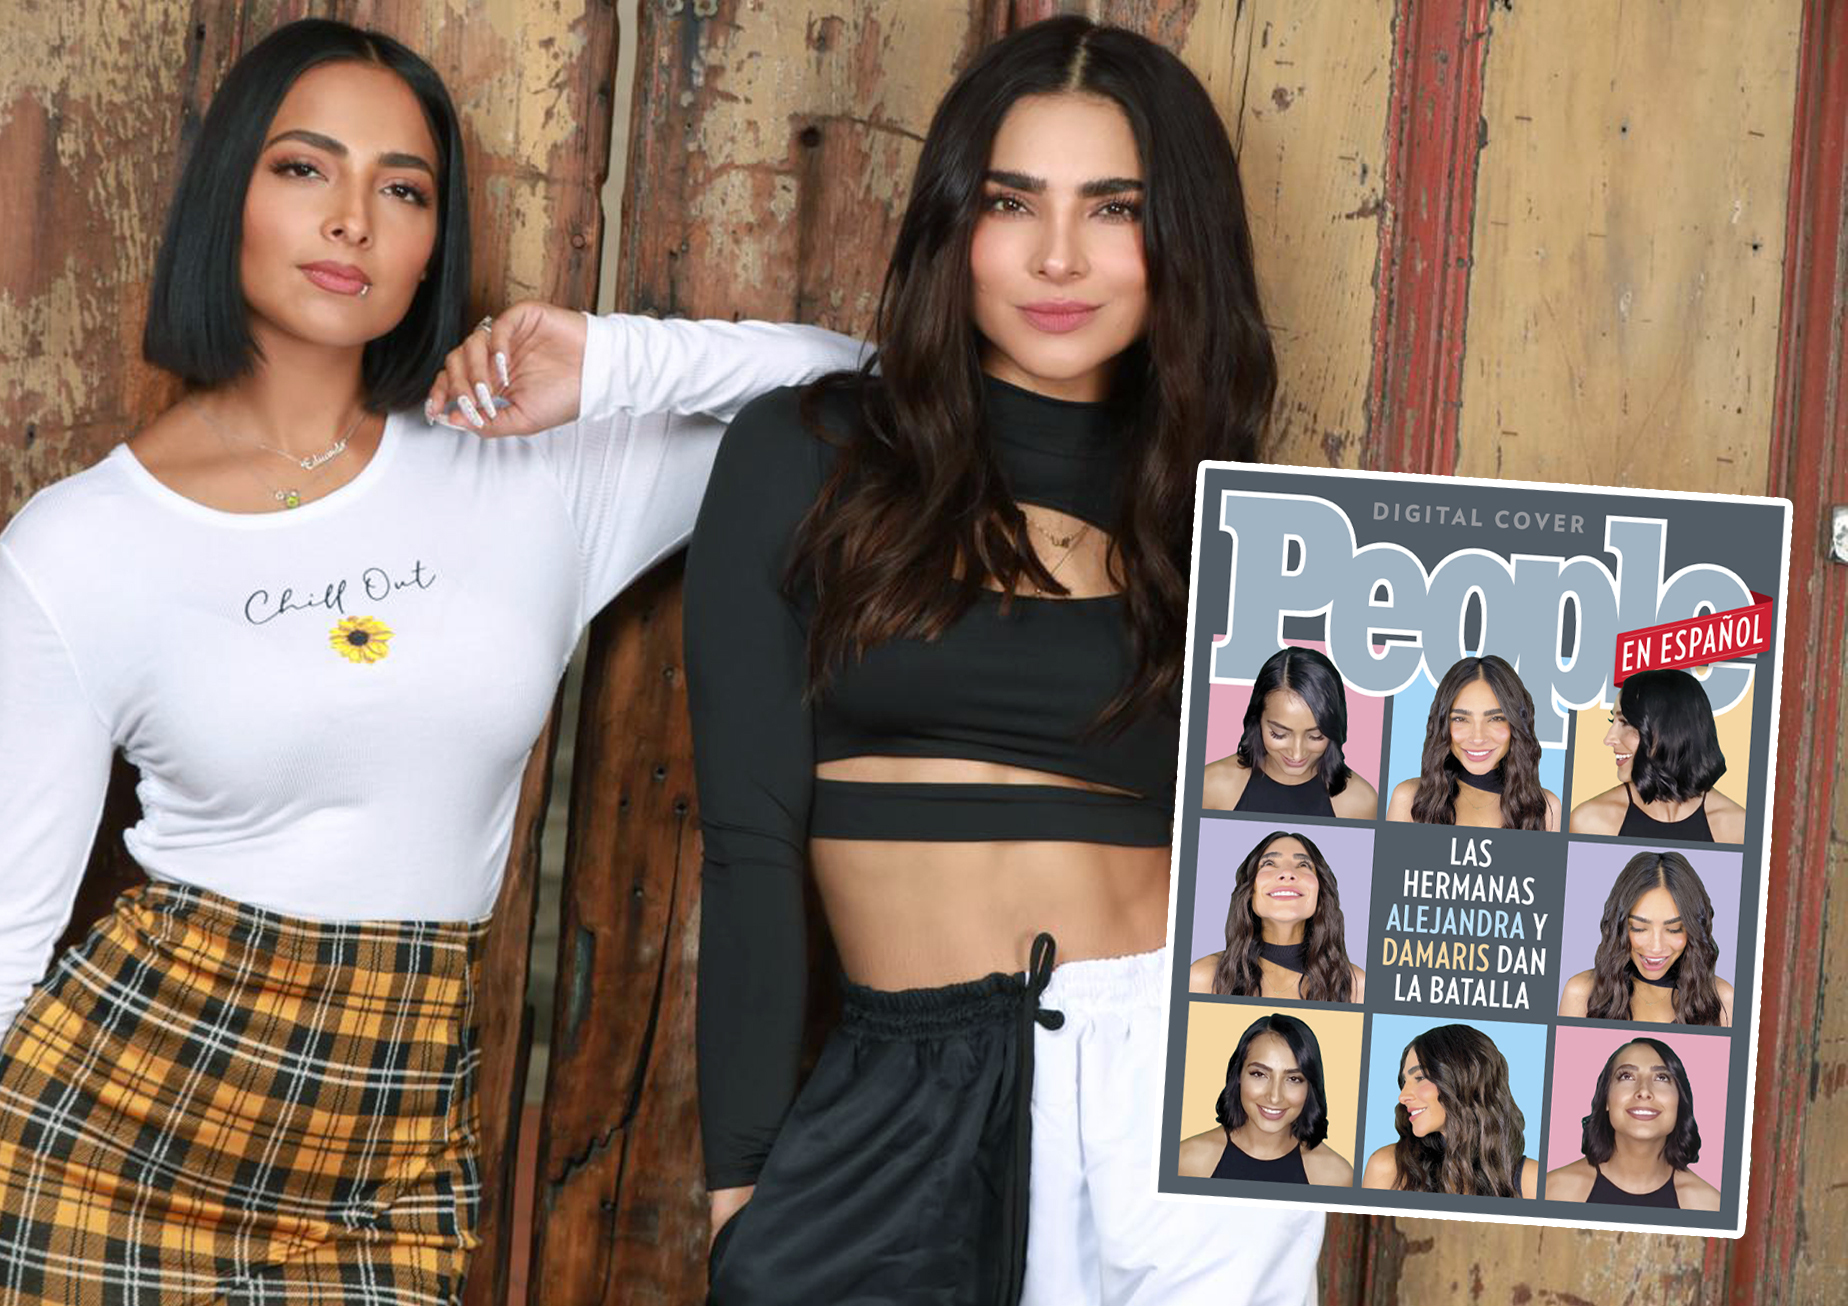 Alejandra Espinoza y Damaris Jimenez Digital Cover